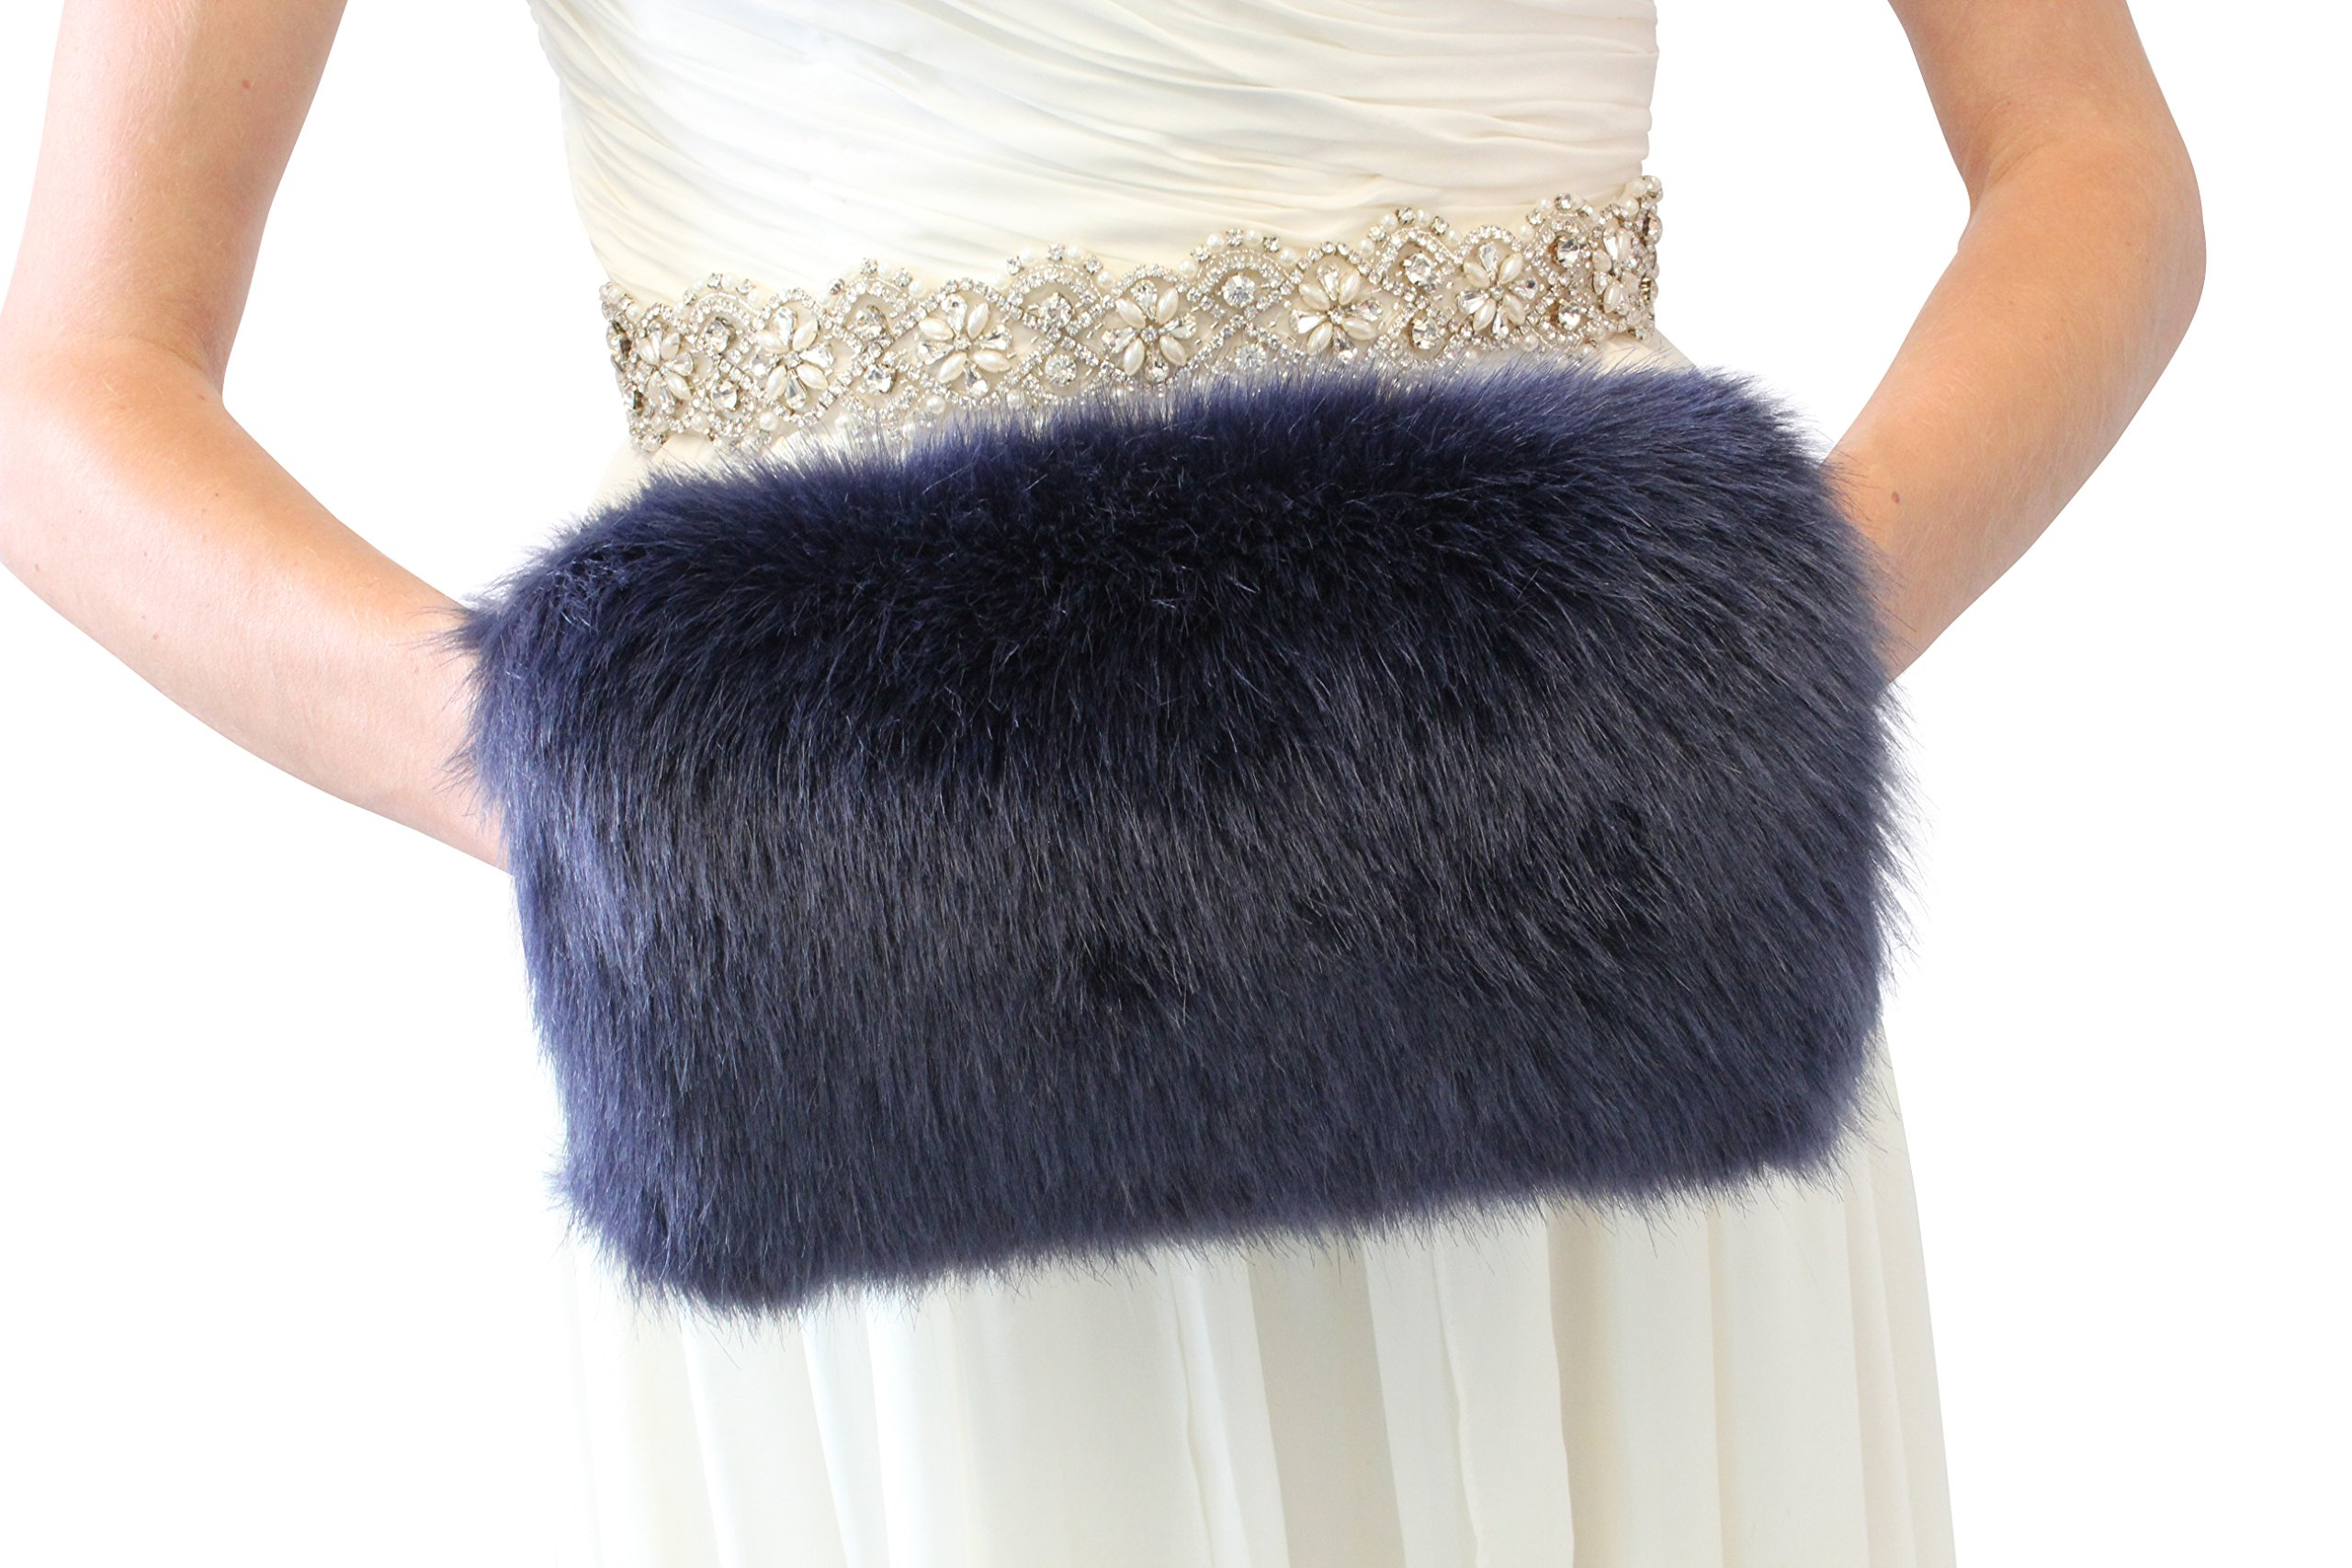 Bridal Fur Hand Muff, Navy Blue Wedding Fur Warmer, Large Adult